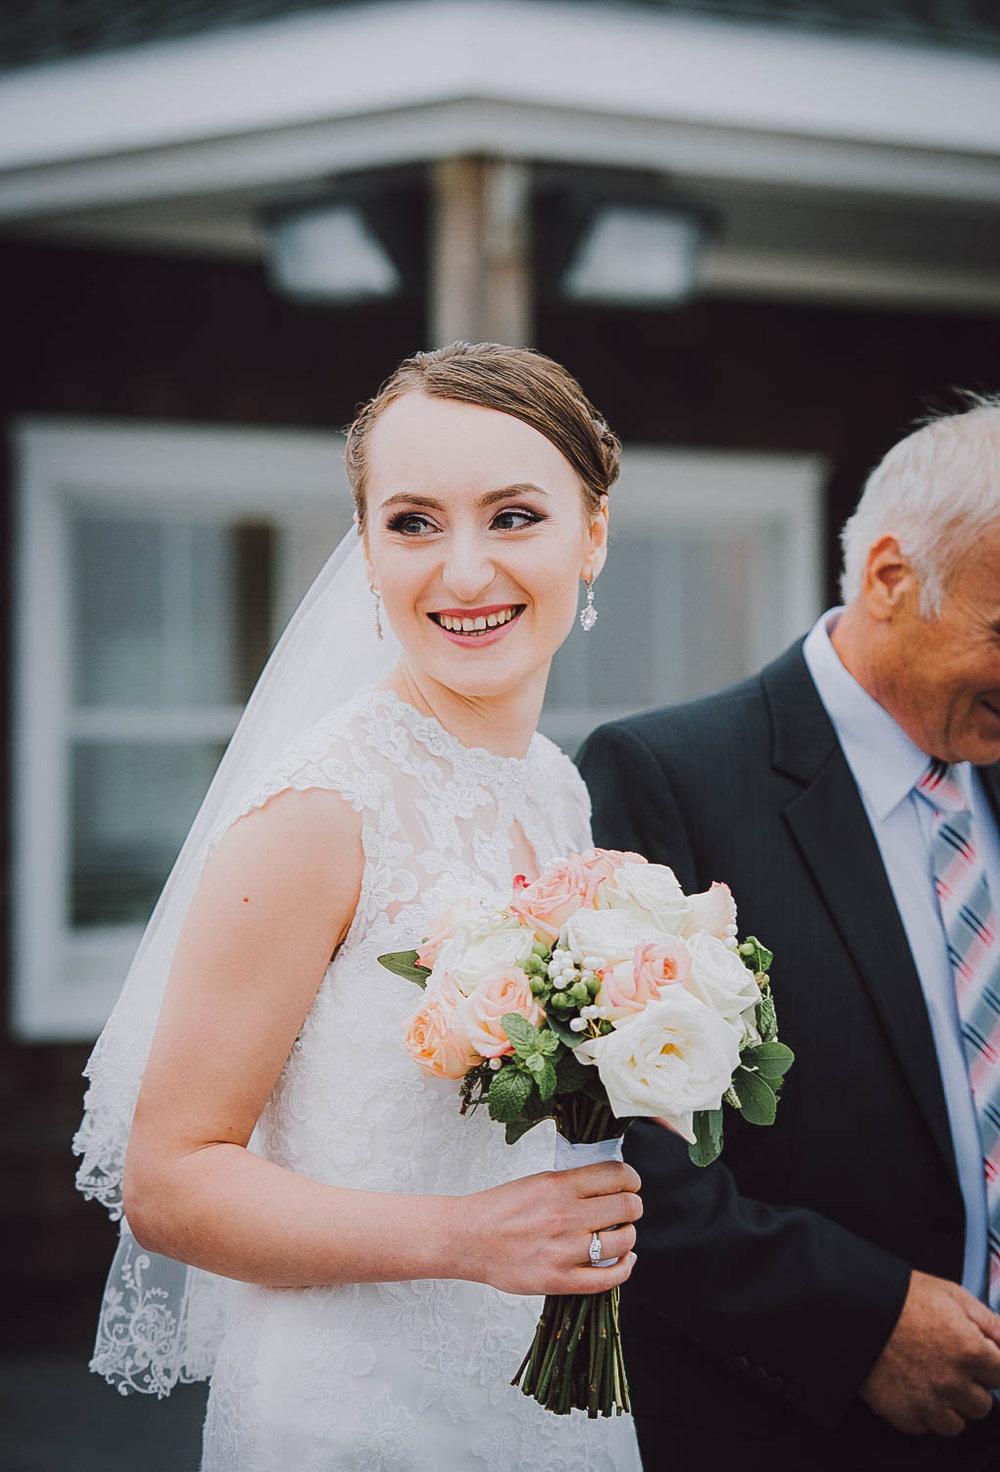 ecaterina-chandu-dondeti-wedding-photography28.jpg